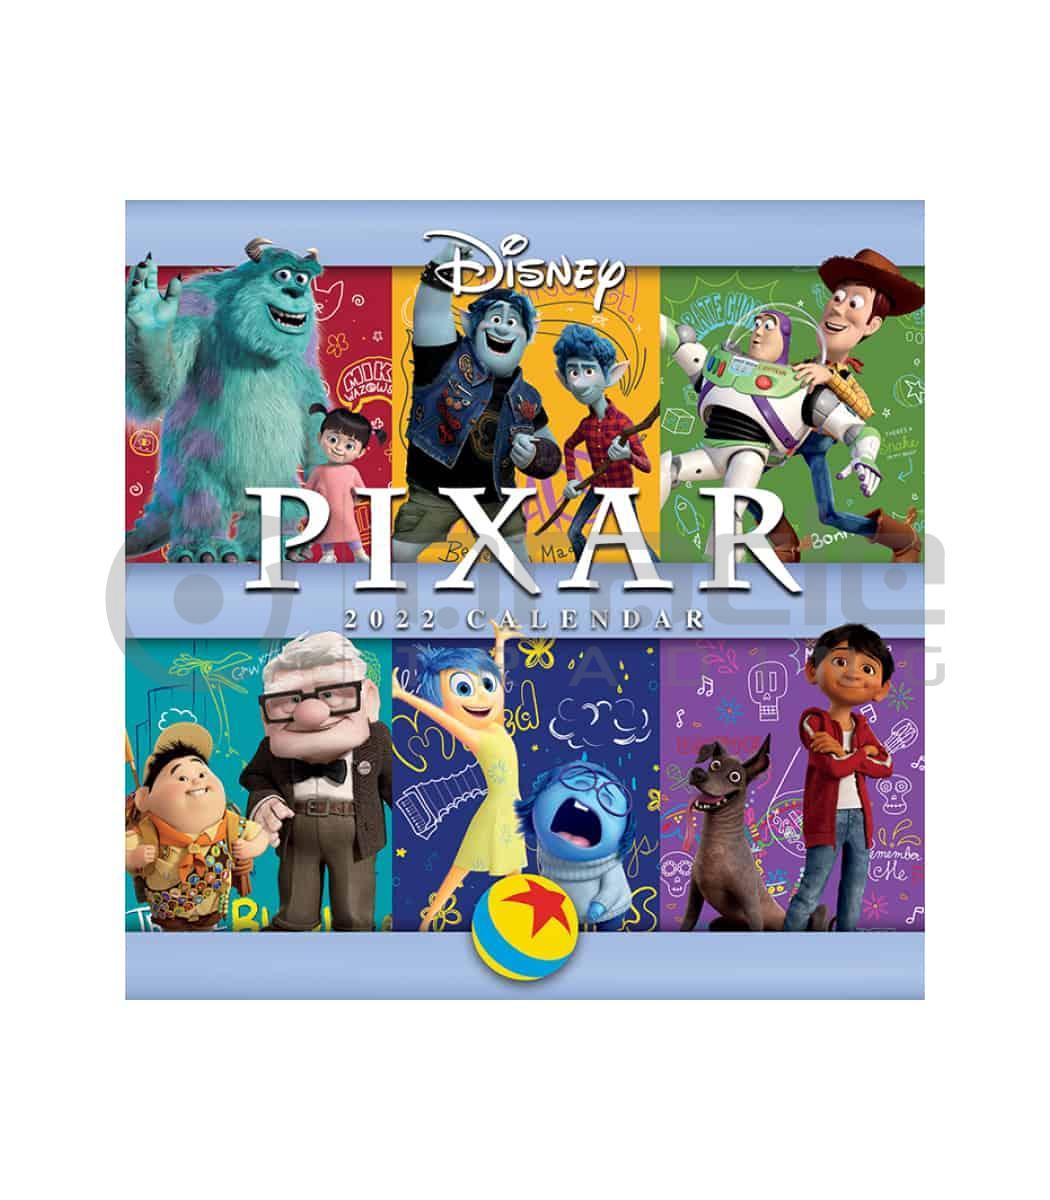 Pixar 2022 Calendar (OCT Delivery)